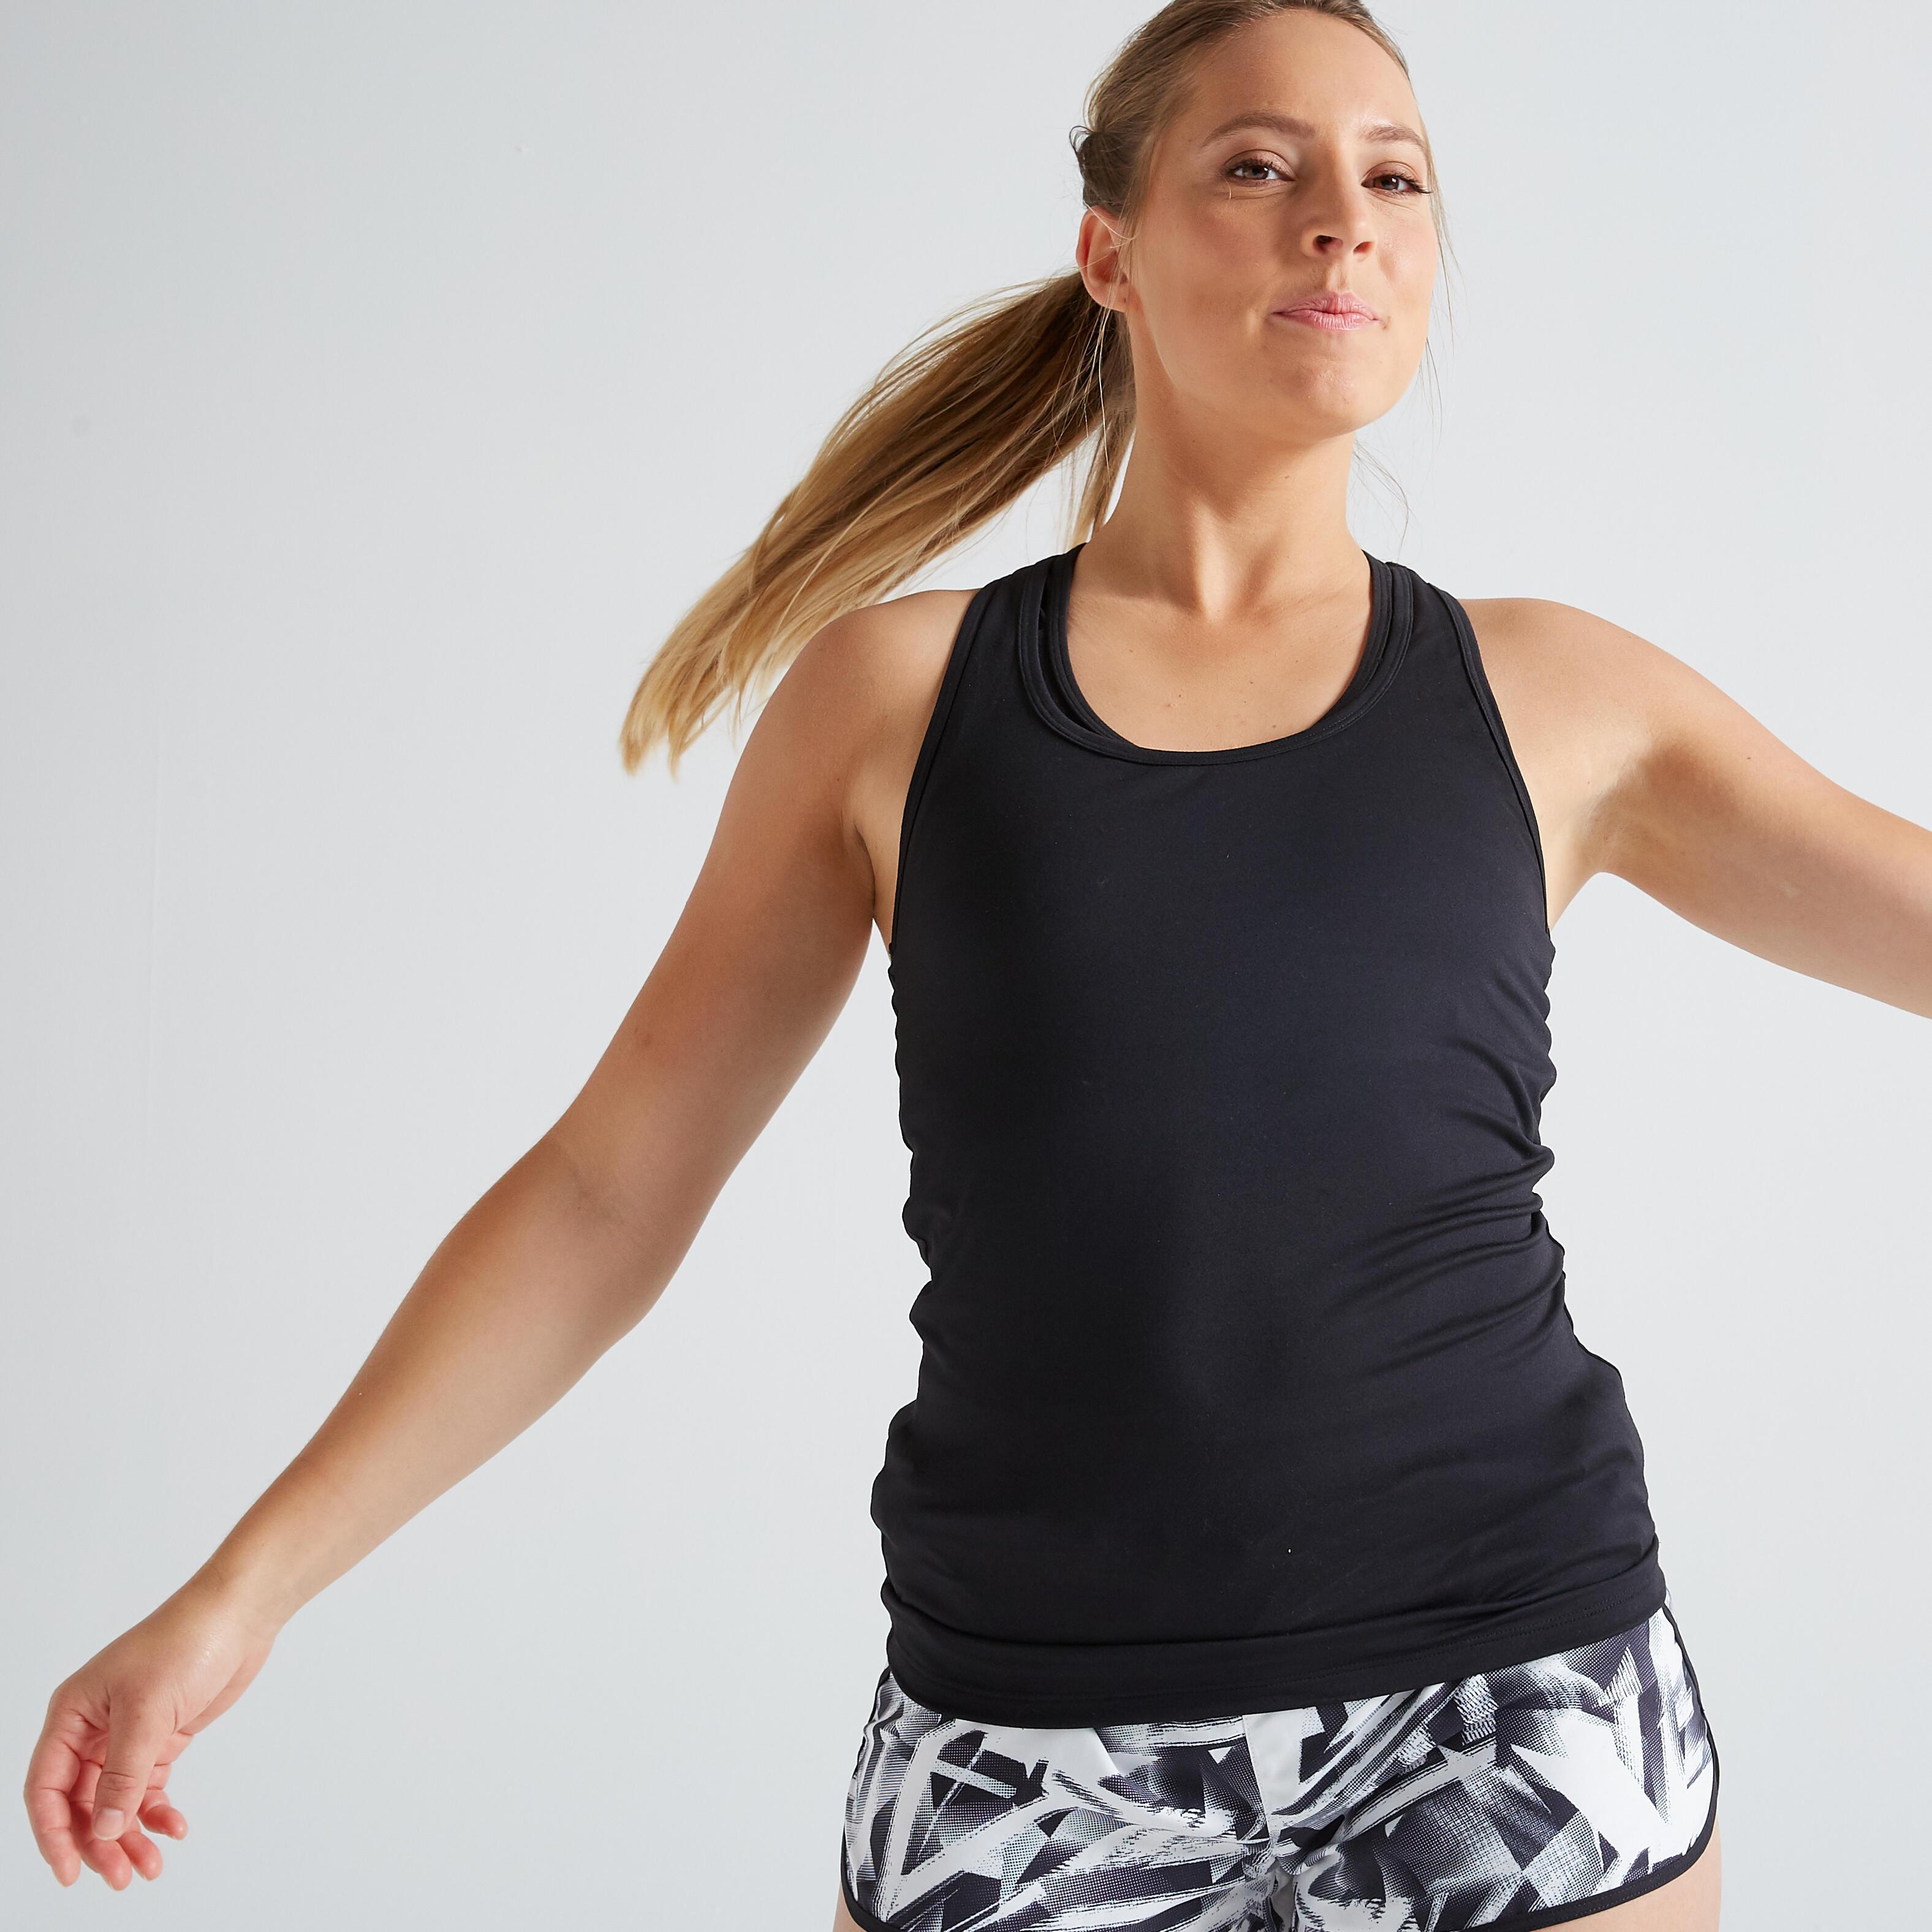 Canotta Donna Top Cotone Elastico Sport Fitness